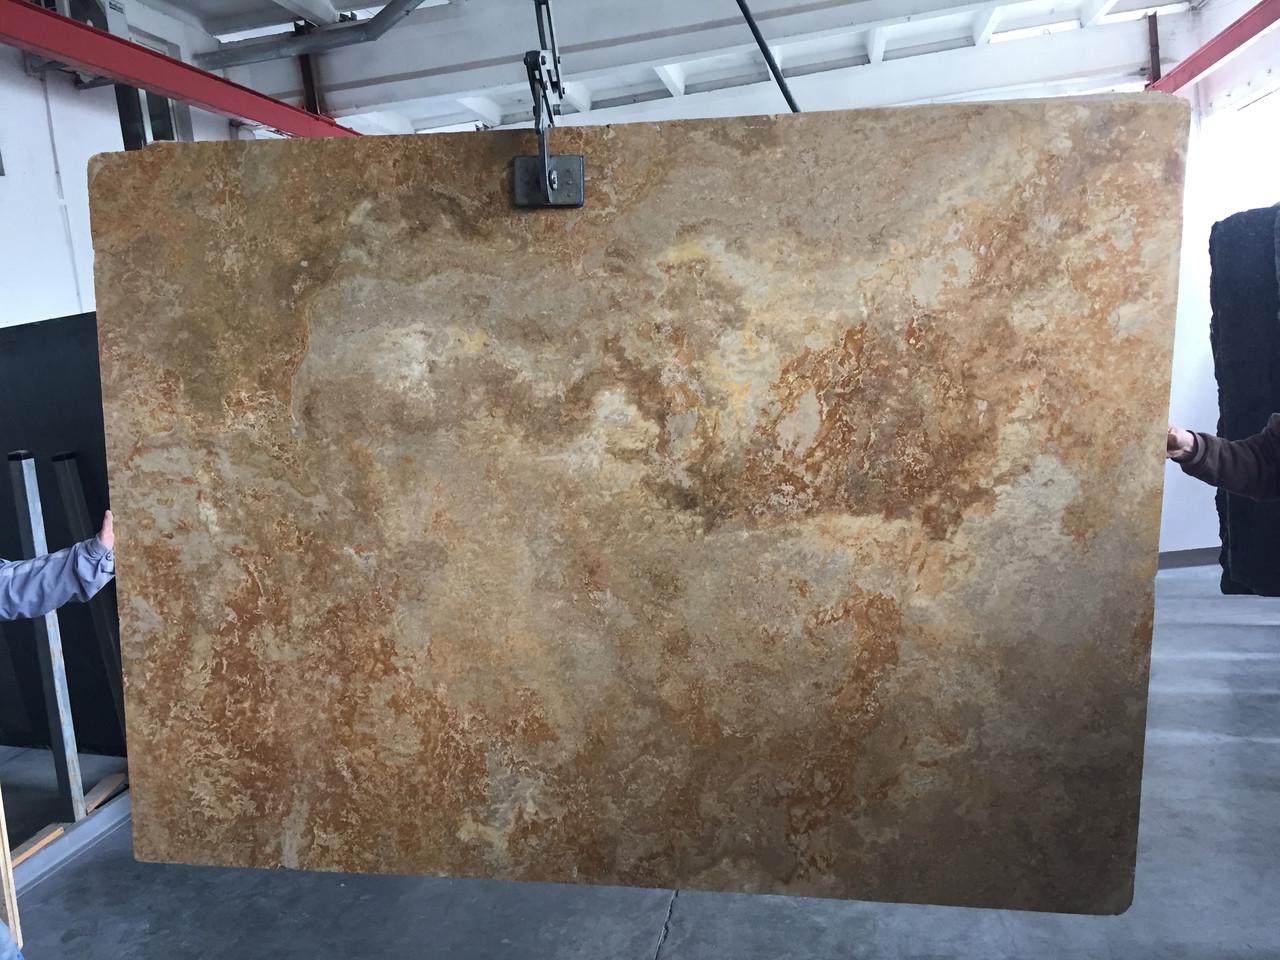 Travertine Gold Filled CC, Слэб травертина (сляб) 20мм